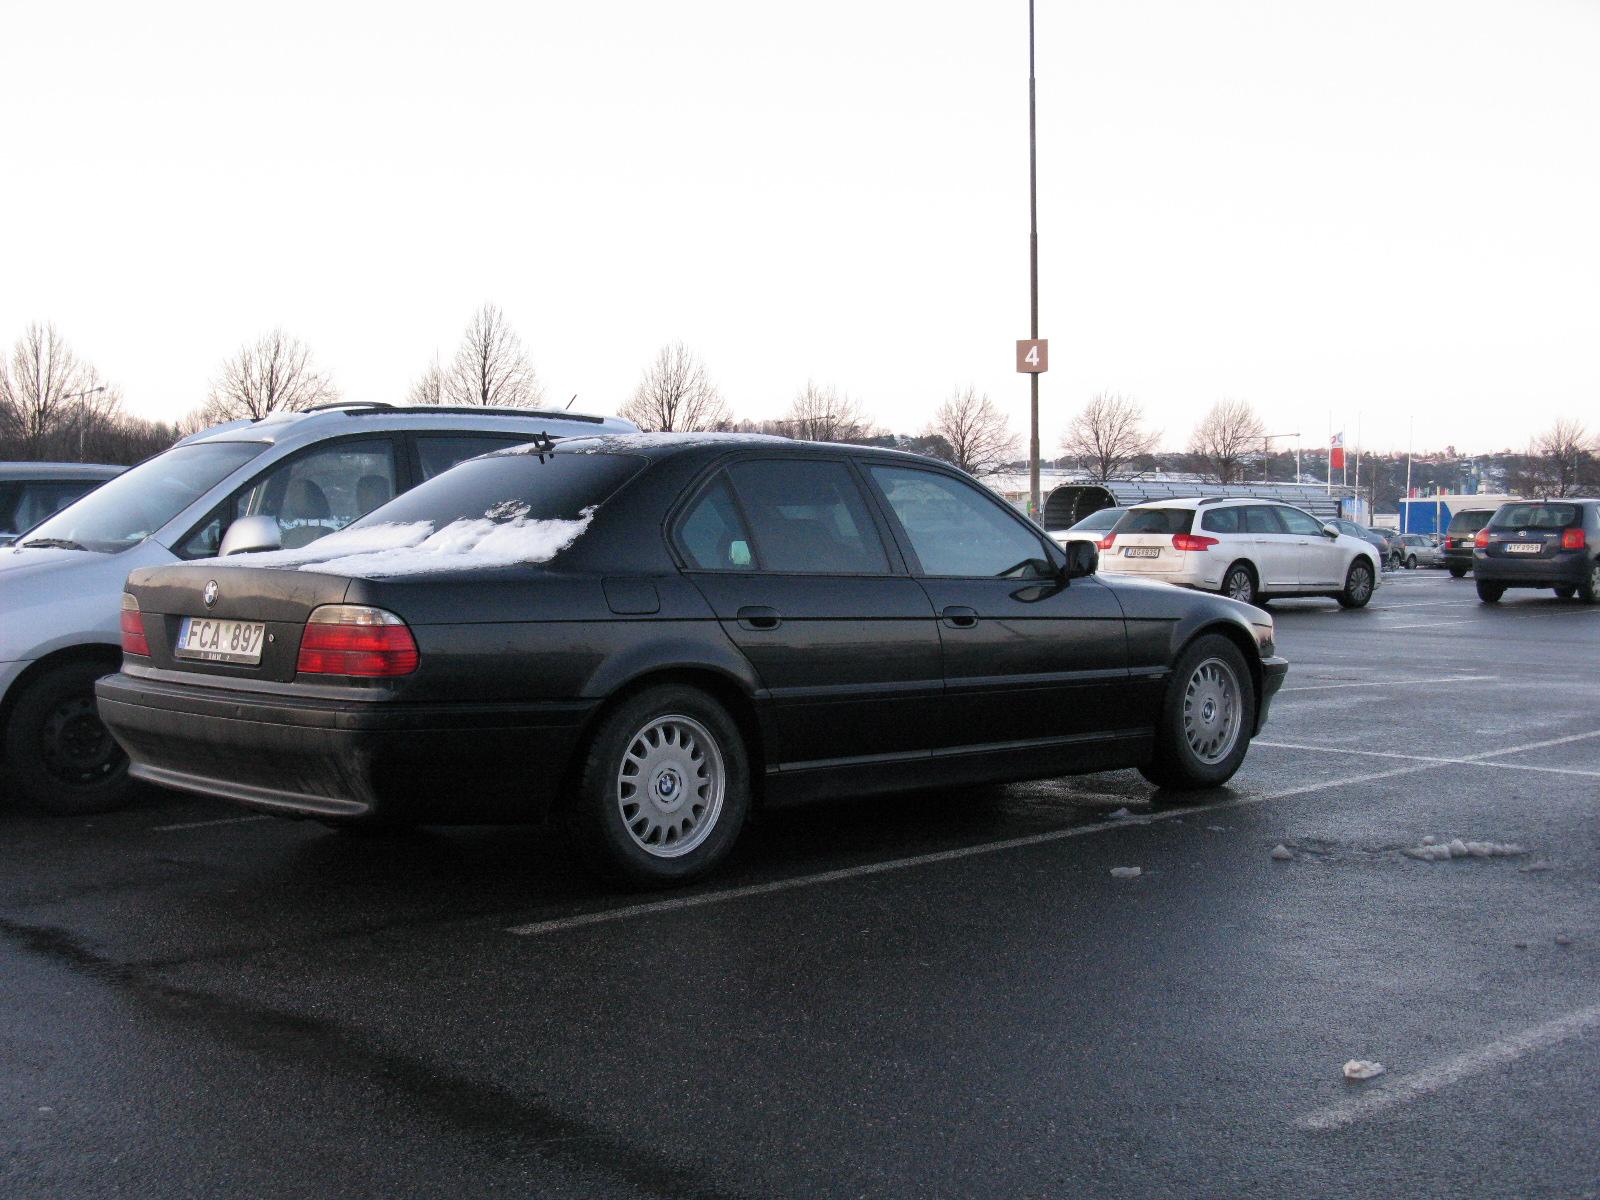 BMW E38 Club - А у вас уже выпал снег?